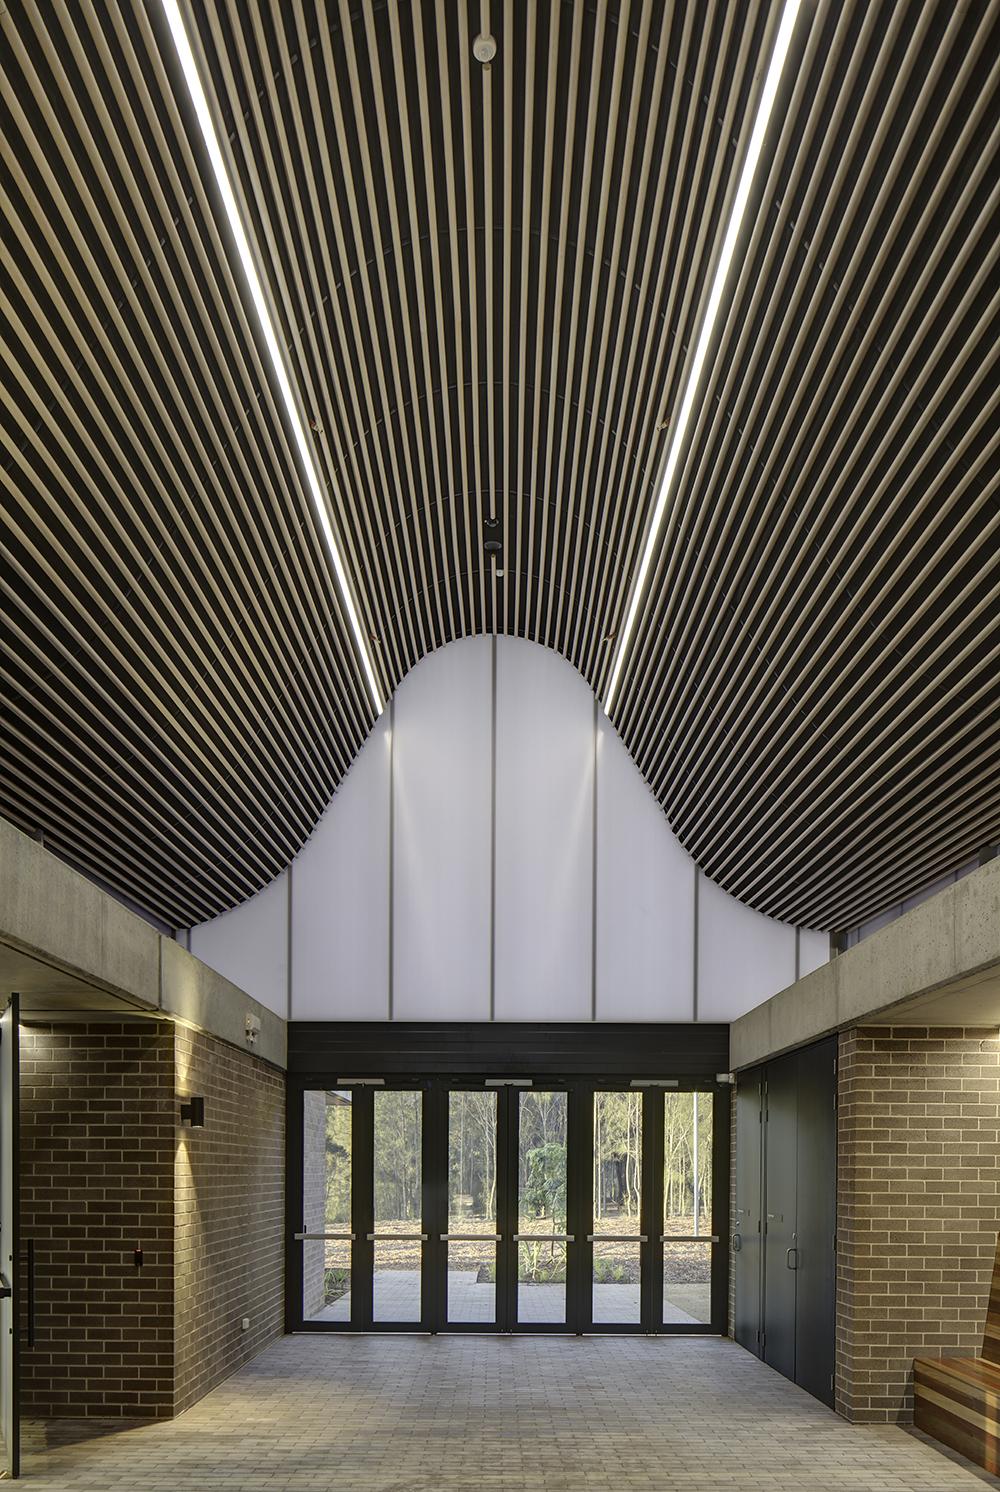 4867-interior_Woodcroft Neighbourhood Centre_Carter Williamson_Brett Boardman_3